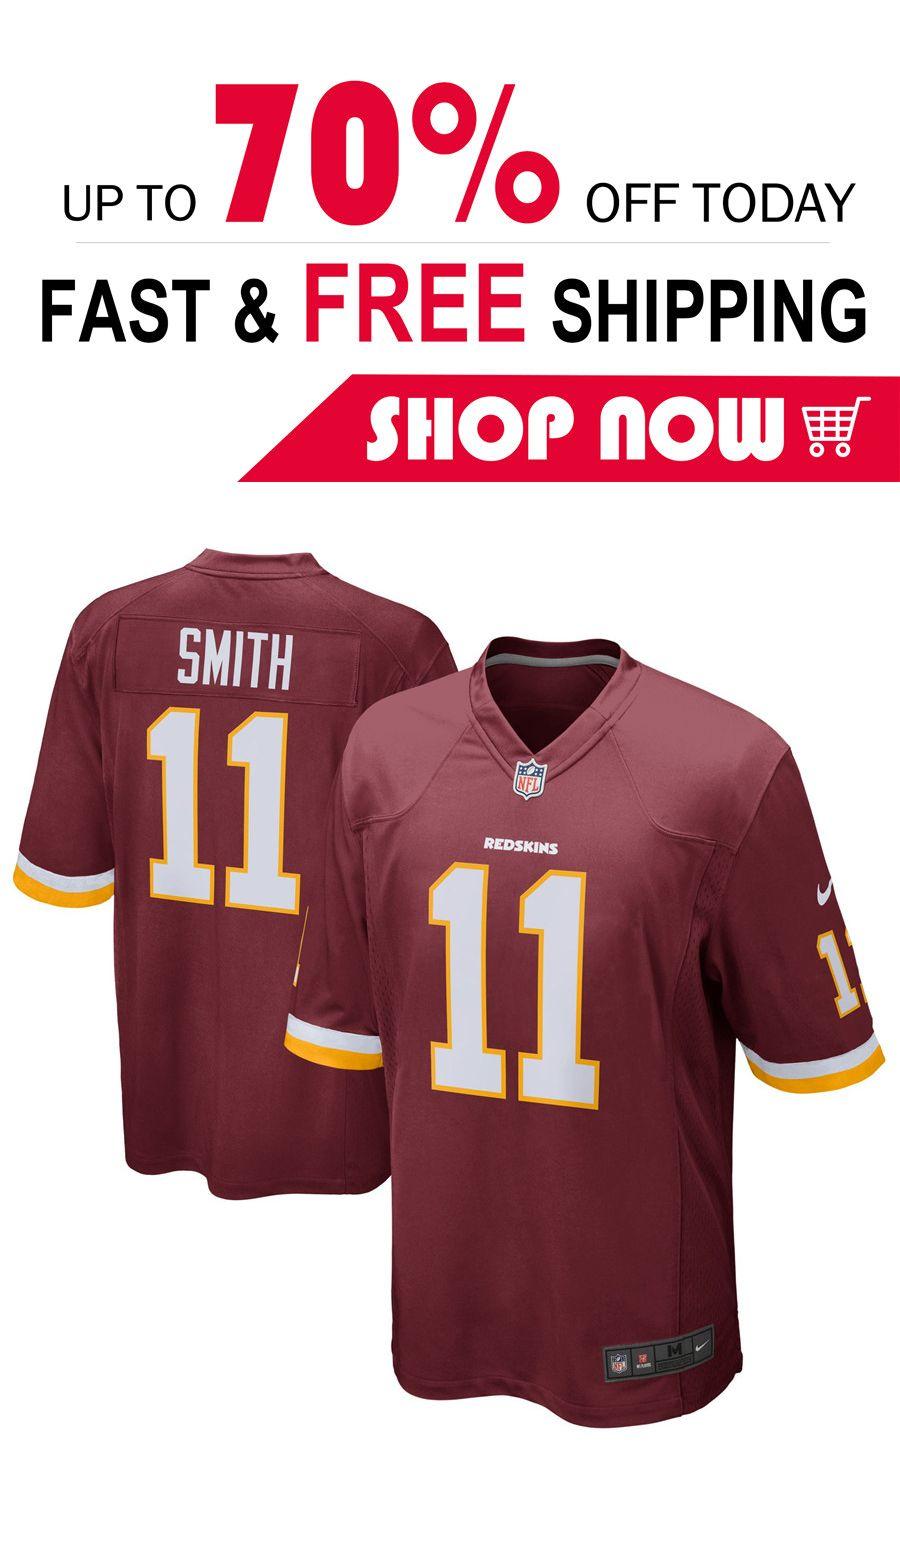 wholesale dealer 535e1 3fad2 2019 的mens Alex Smith Washington Redskins football jersey ...